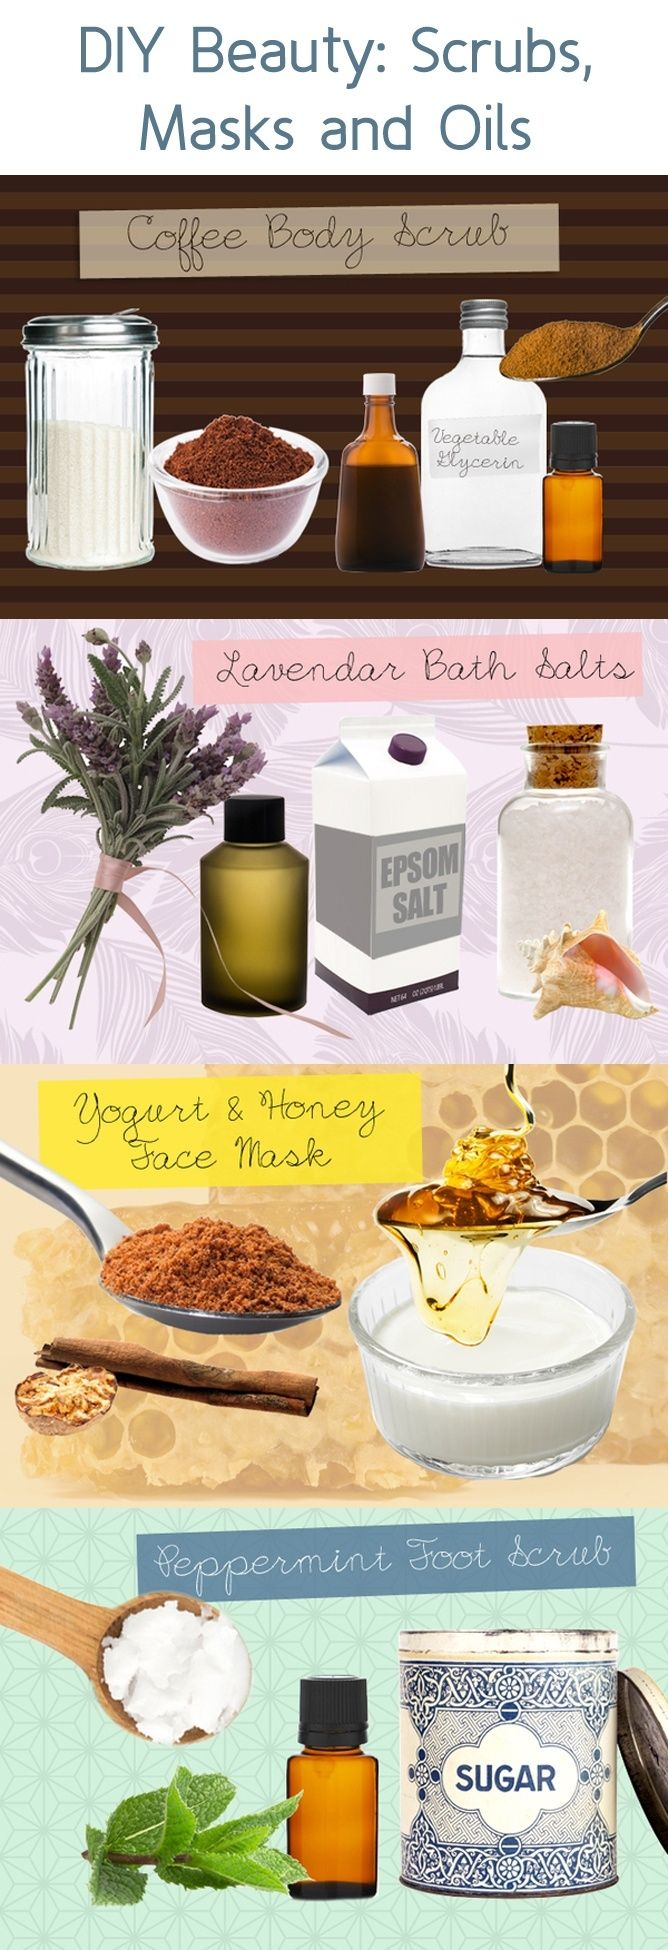 DIY Beauty Scrubs Masks and Oils #beauty #DIY #skincare